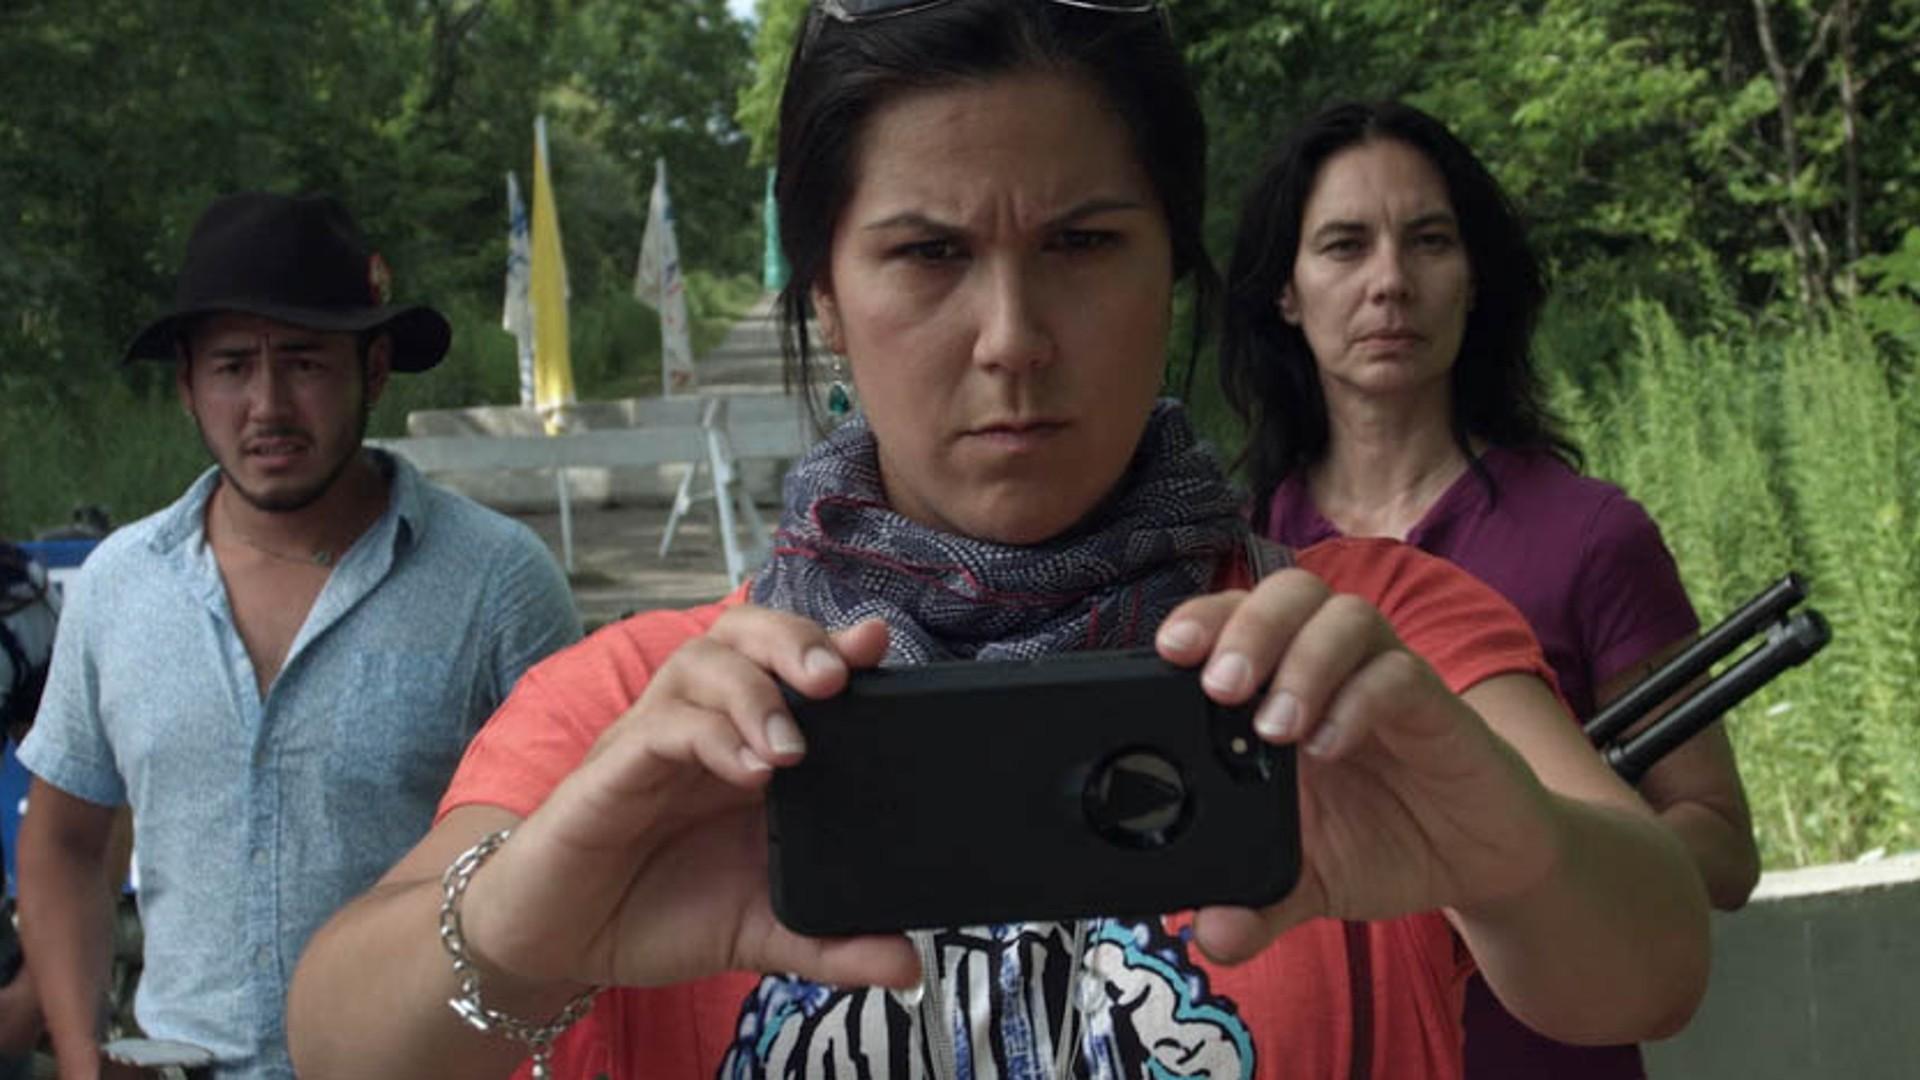 Québexit Trailer: Sharp Political Satire